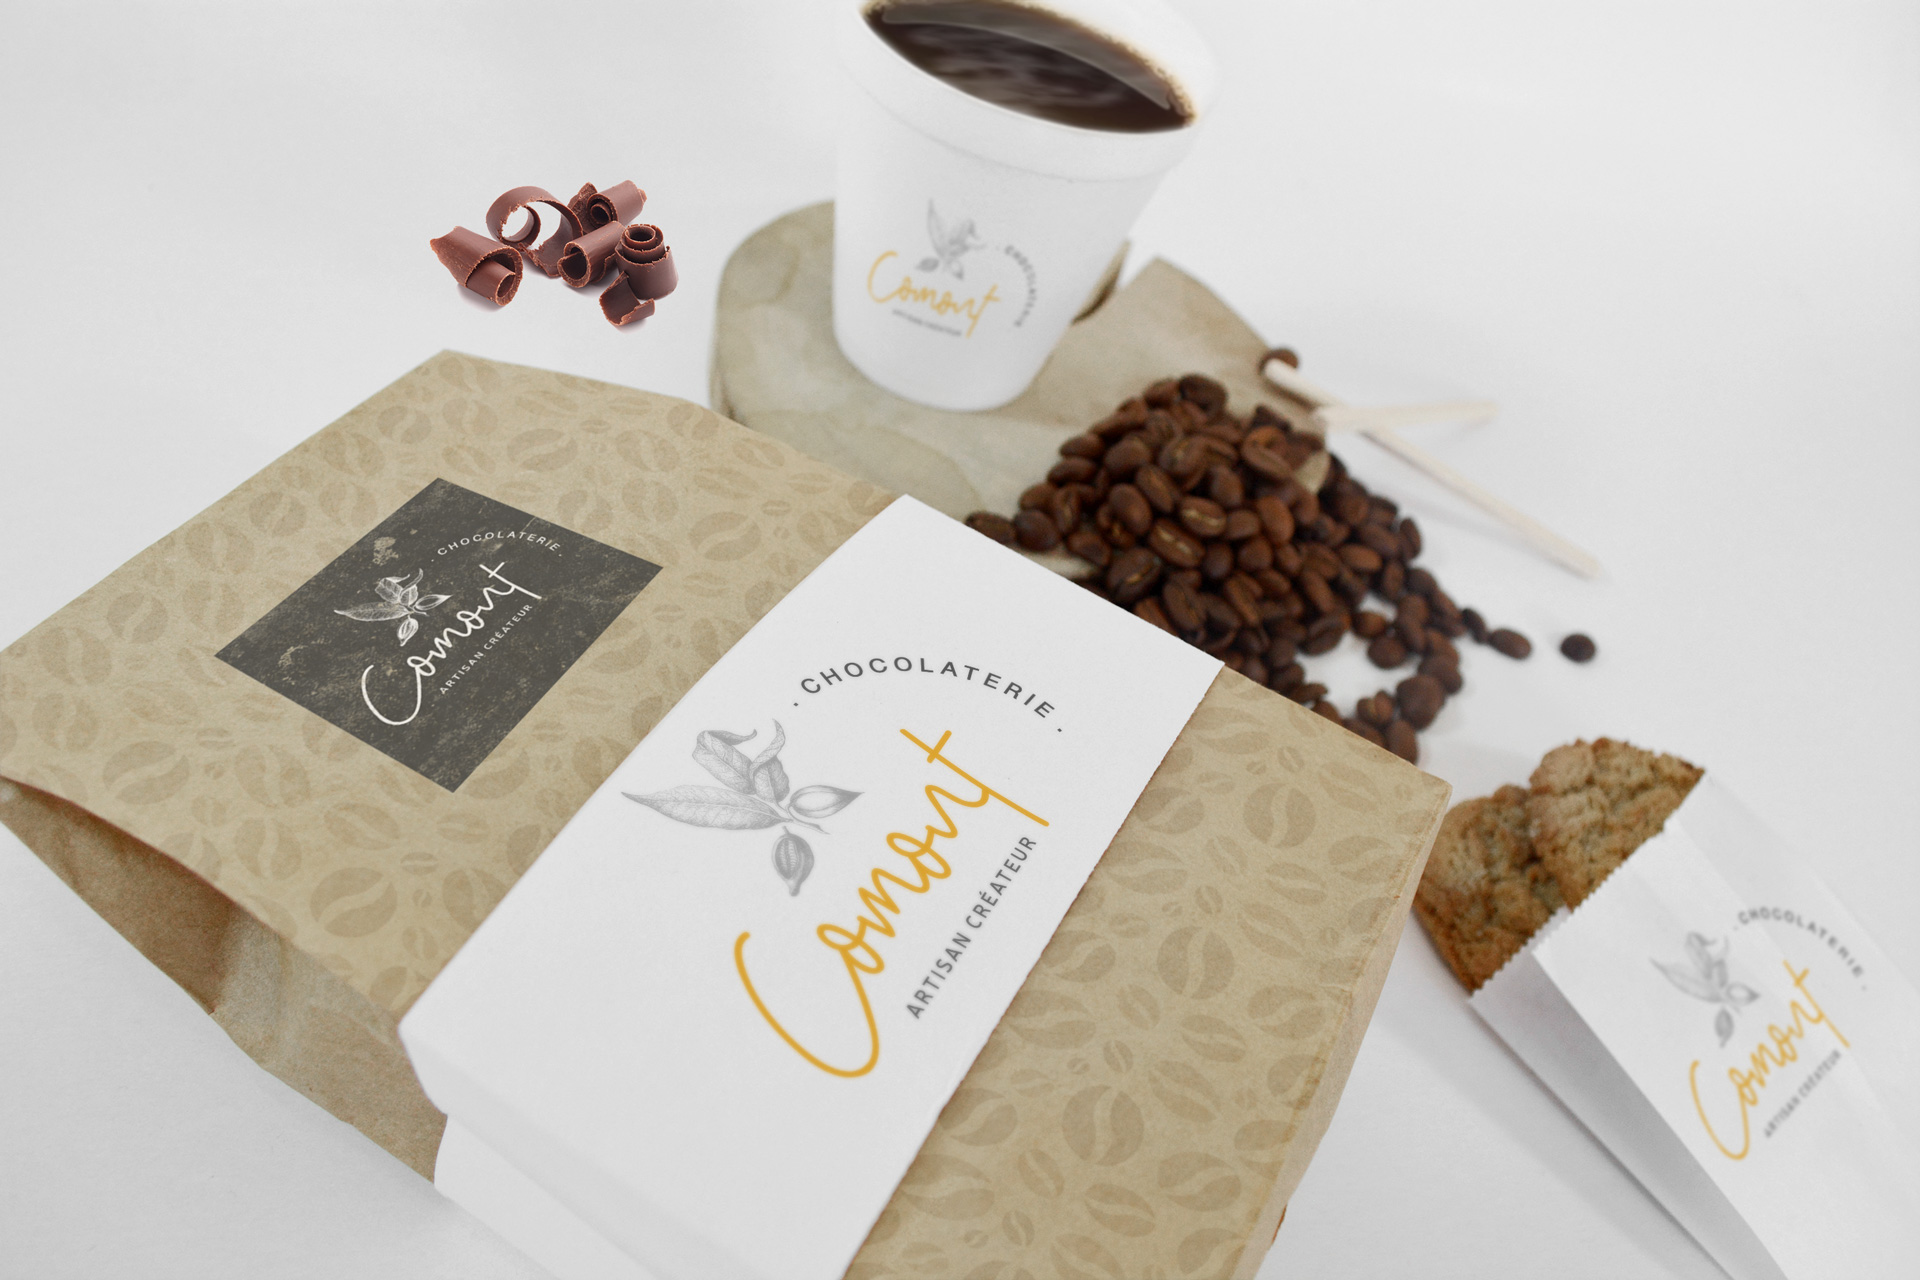 crer-une-identite-visuelle-pour-chocolaterie-Agence-Coqueliko-Lannion